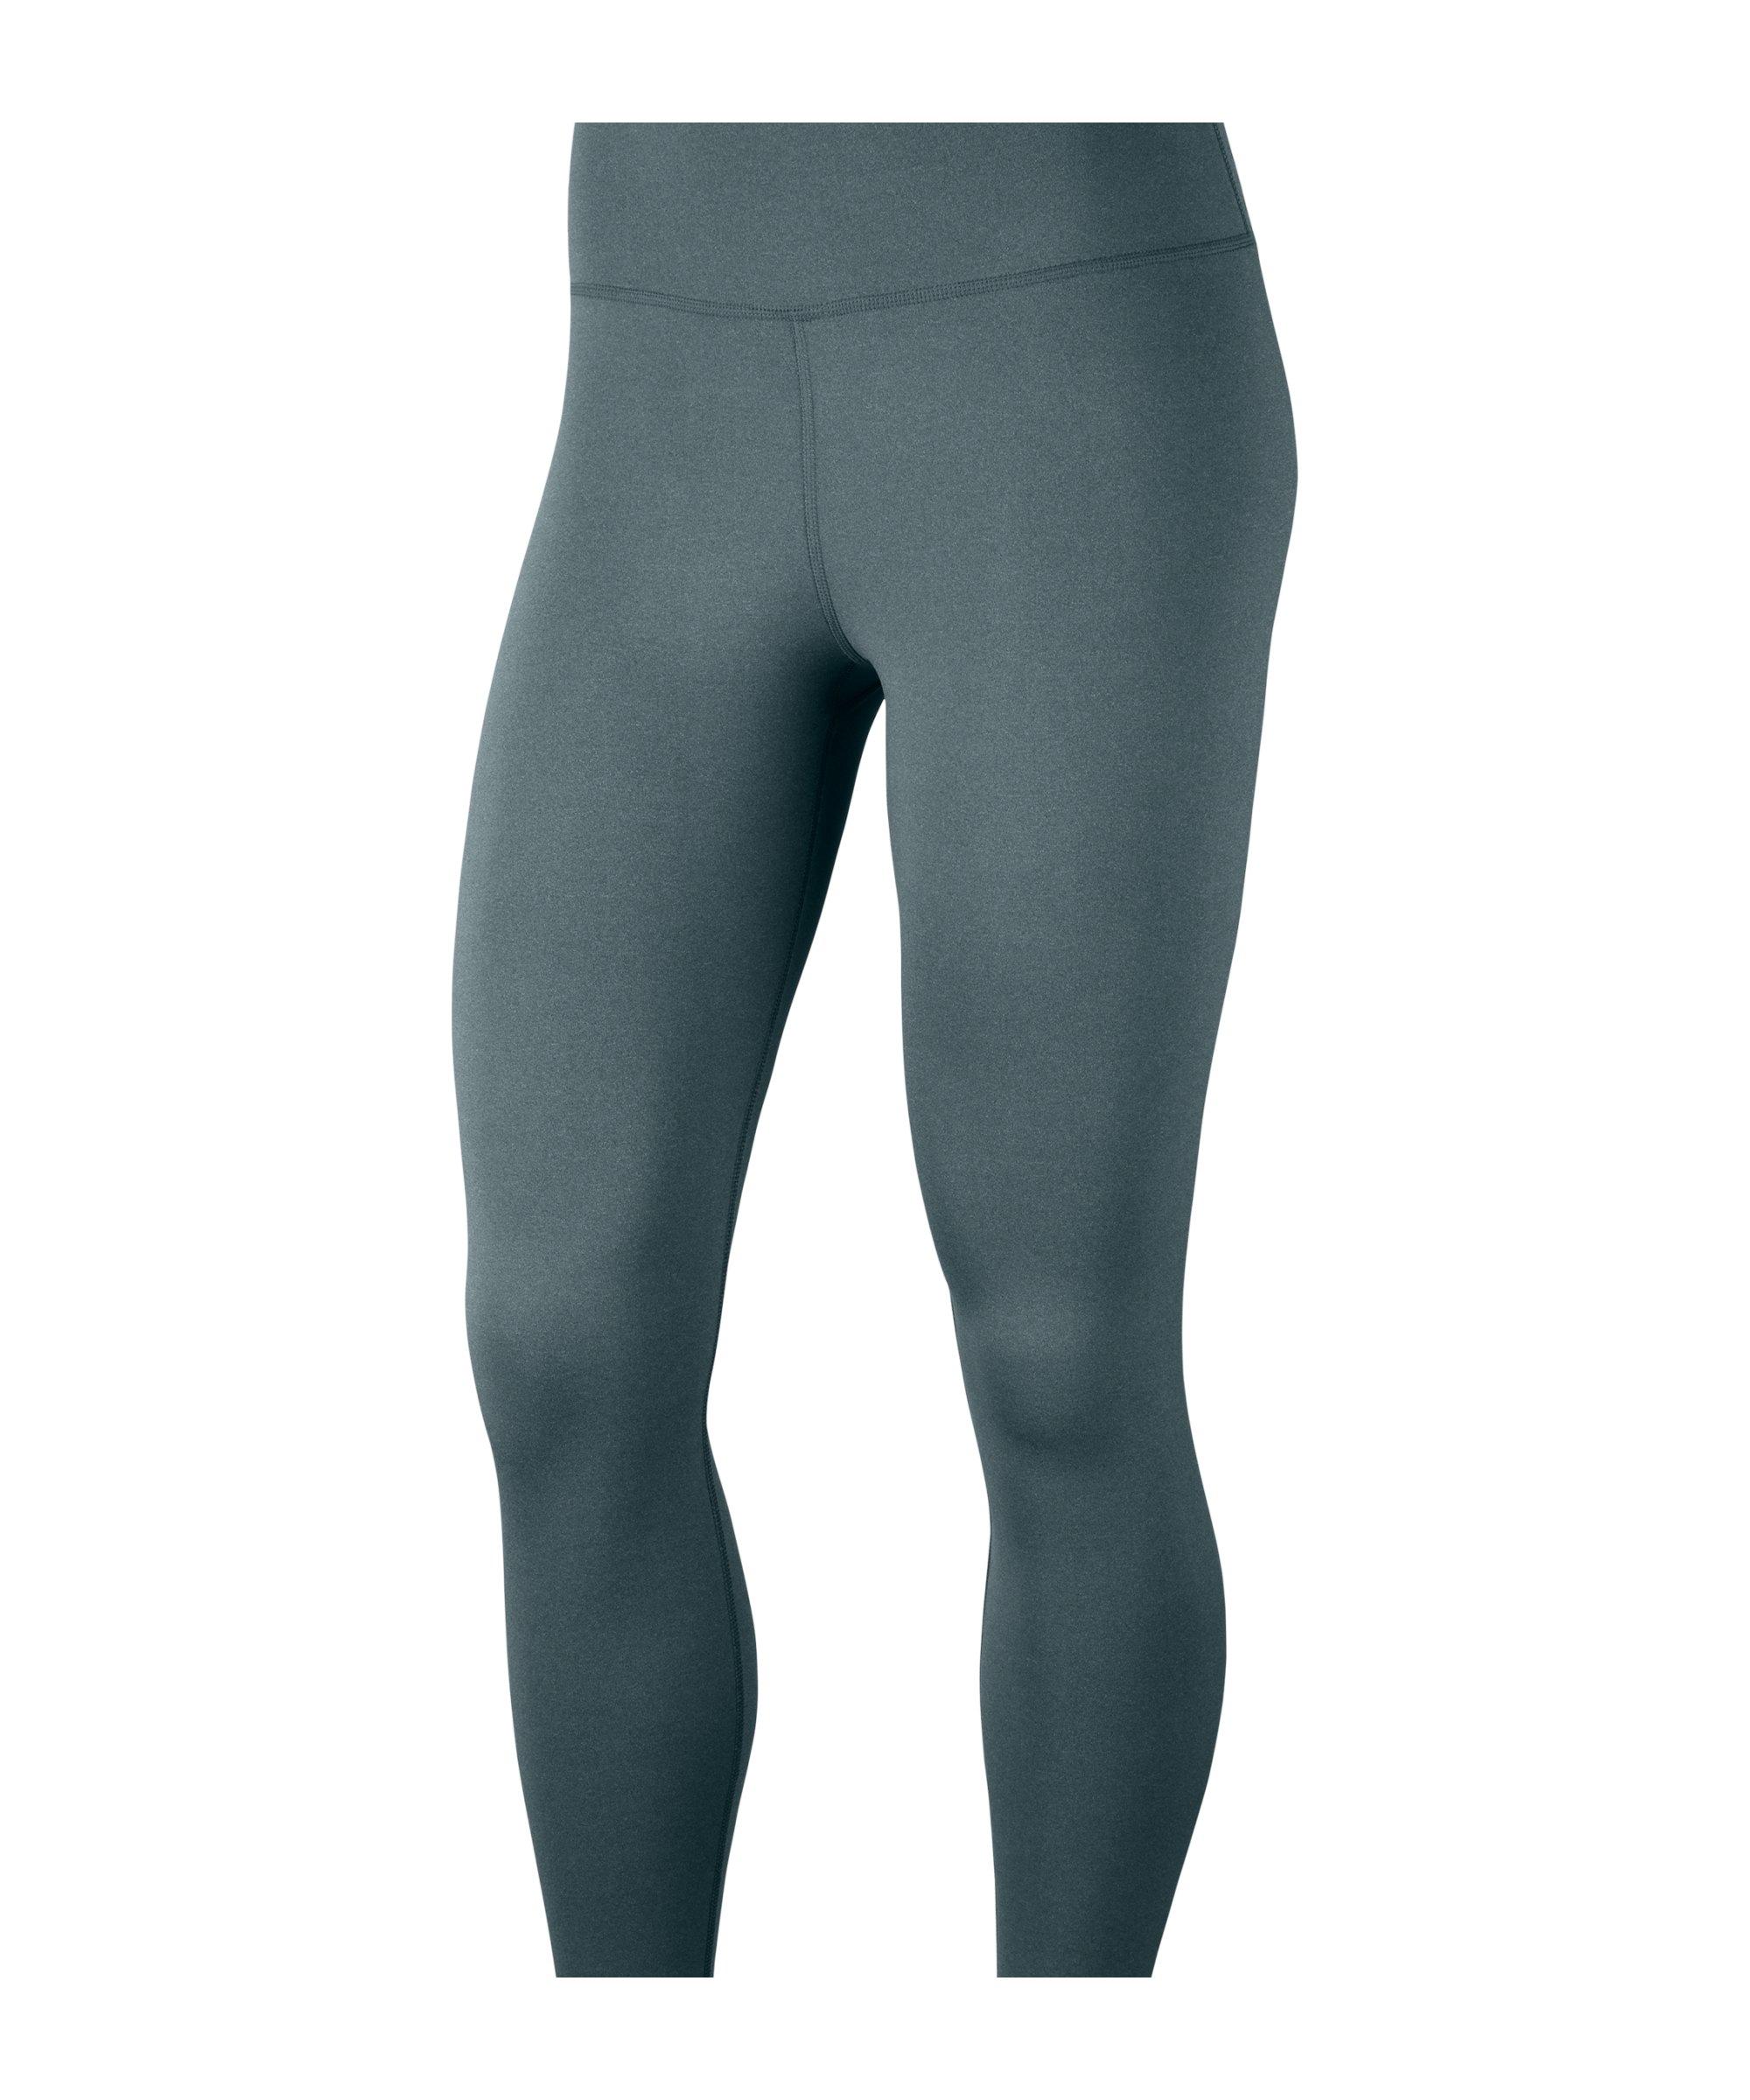 Nike Yoga 7/8 Leggings Training Damen Grün F387 - gruen